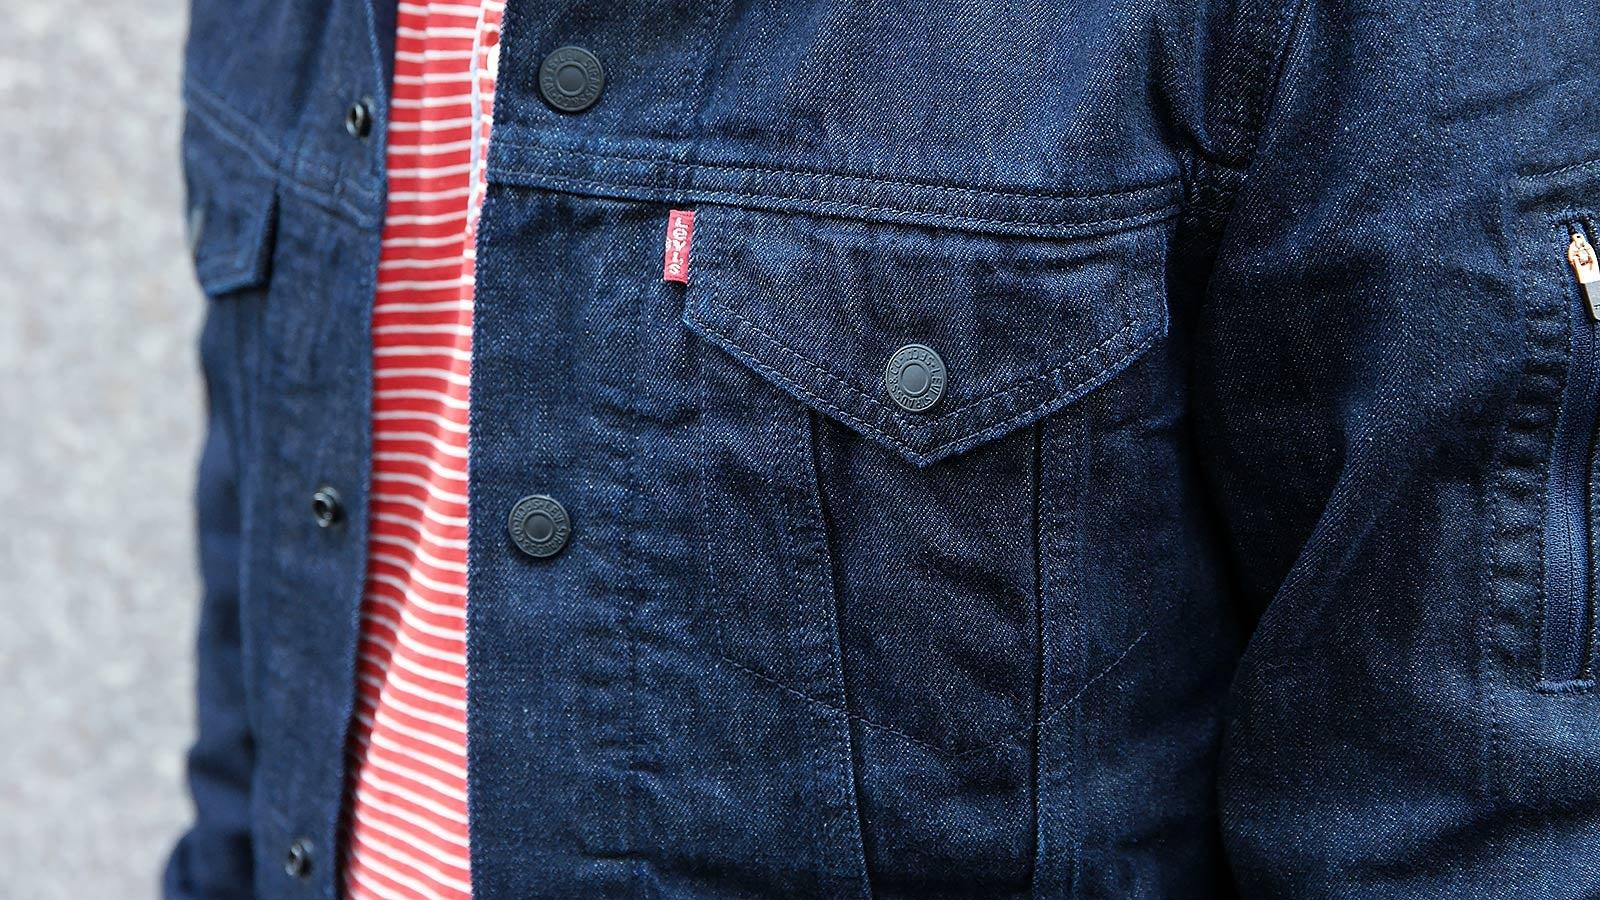 Google Jacquard Smart Jacket: The Gizmodo Review | Gizmodo